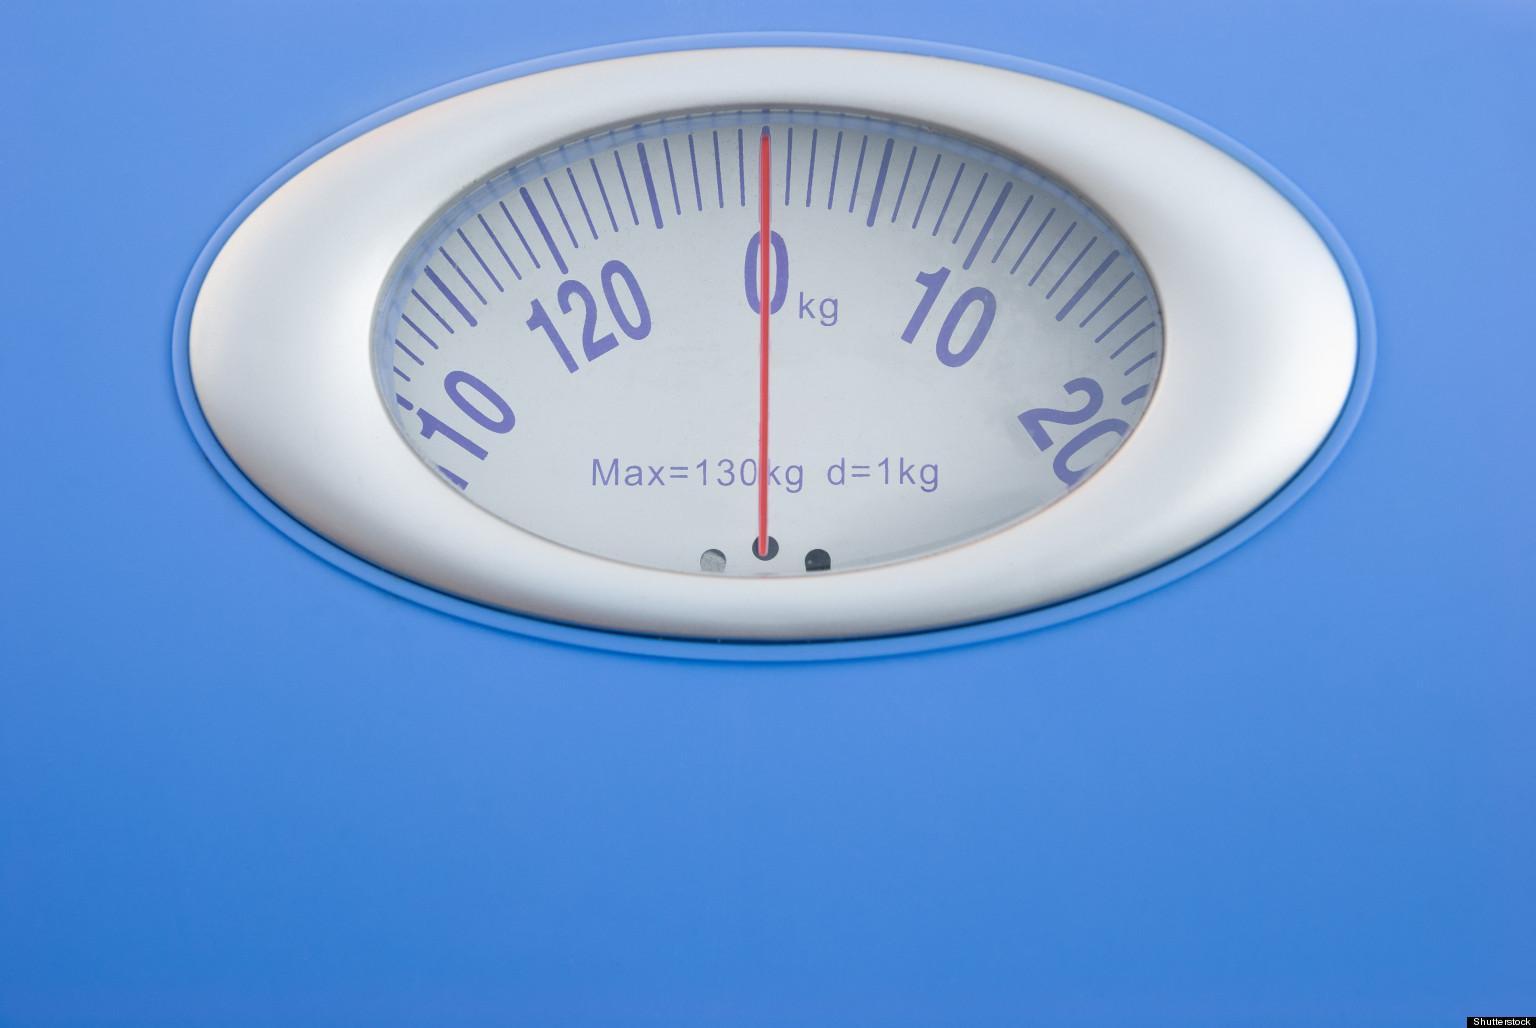 Weight loss trokendi xr